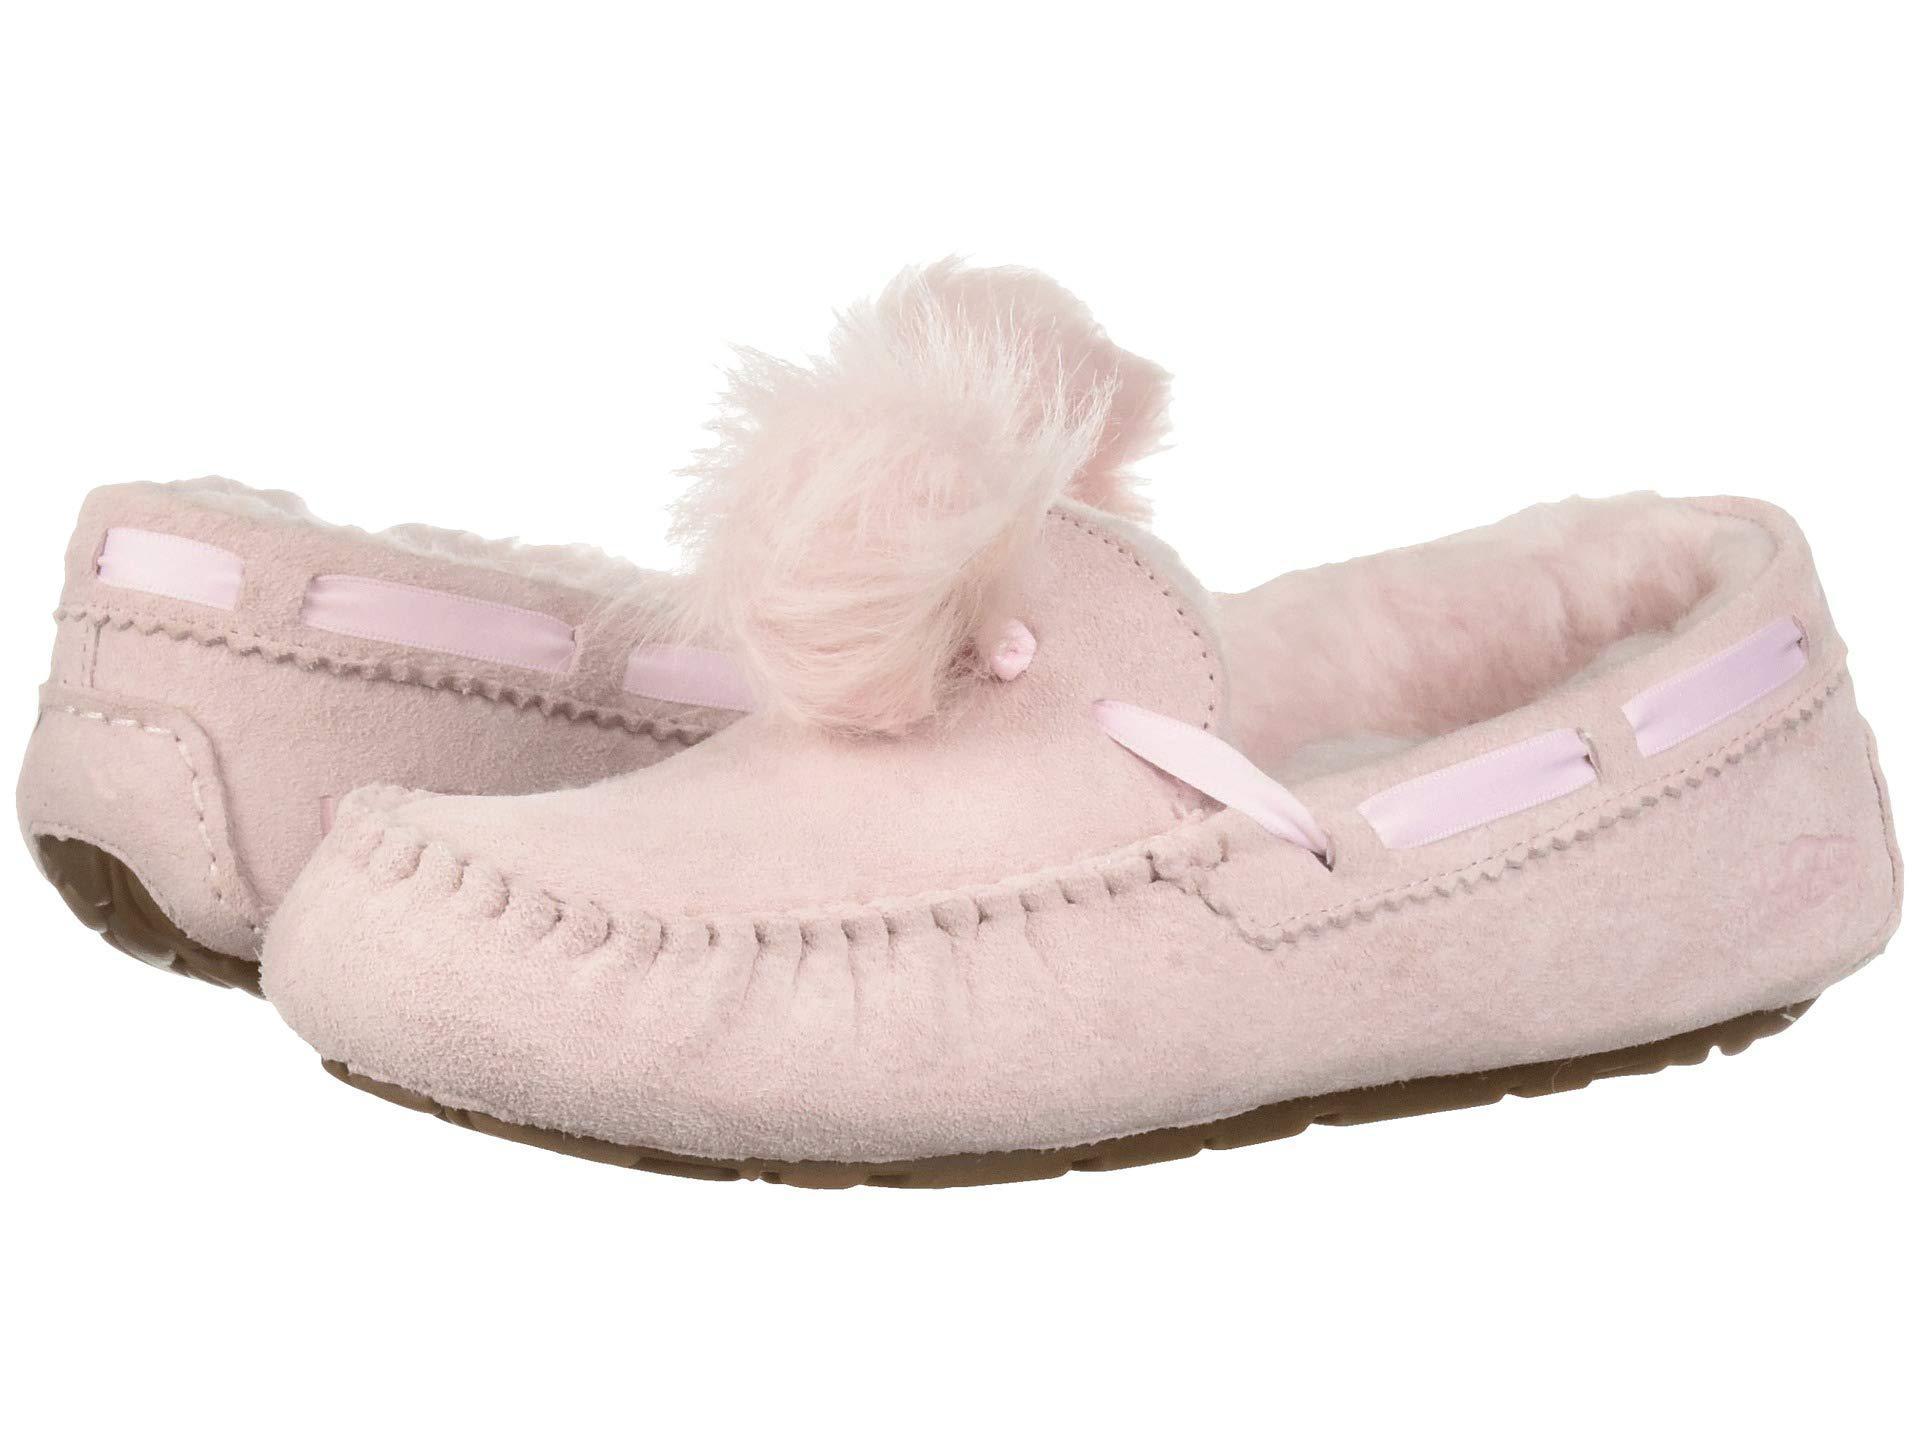 f34cbd8656f Ugg Pink Dakota Pom Pom (chestnut) Women's Flat Shoes